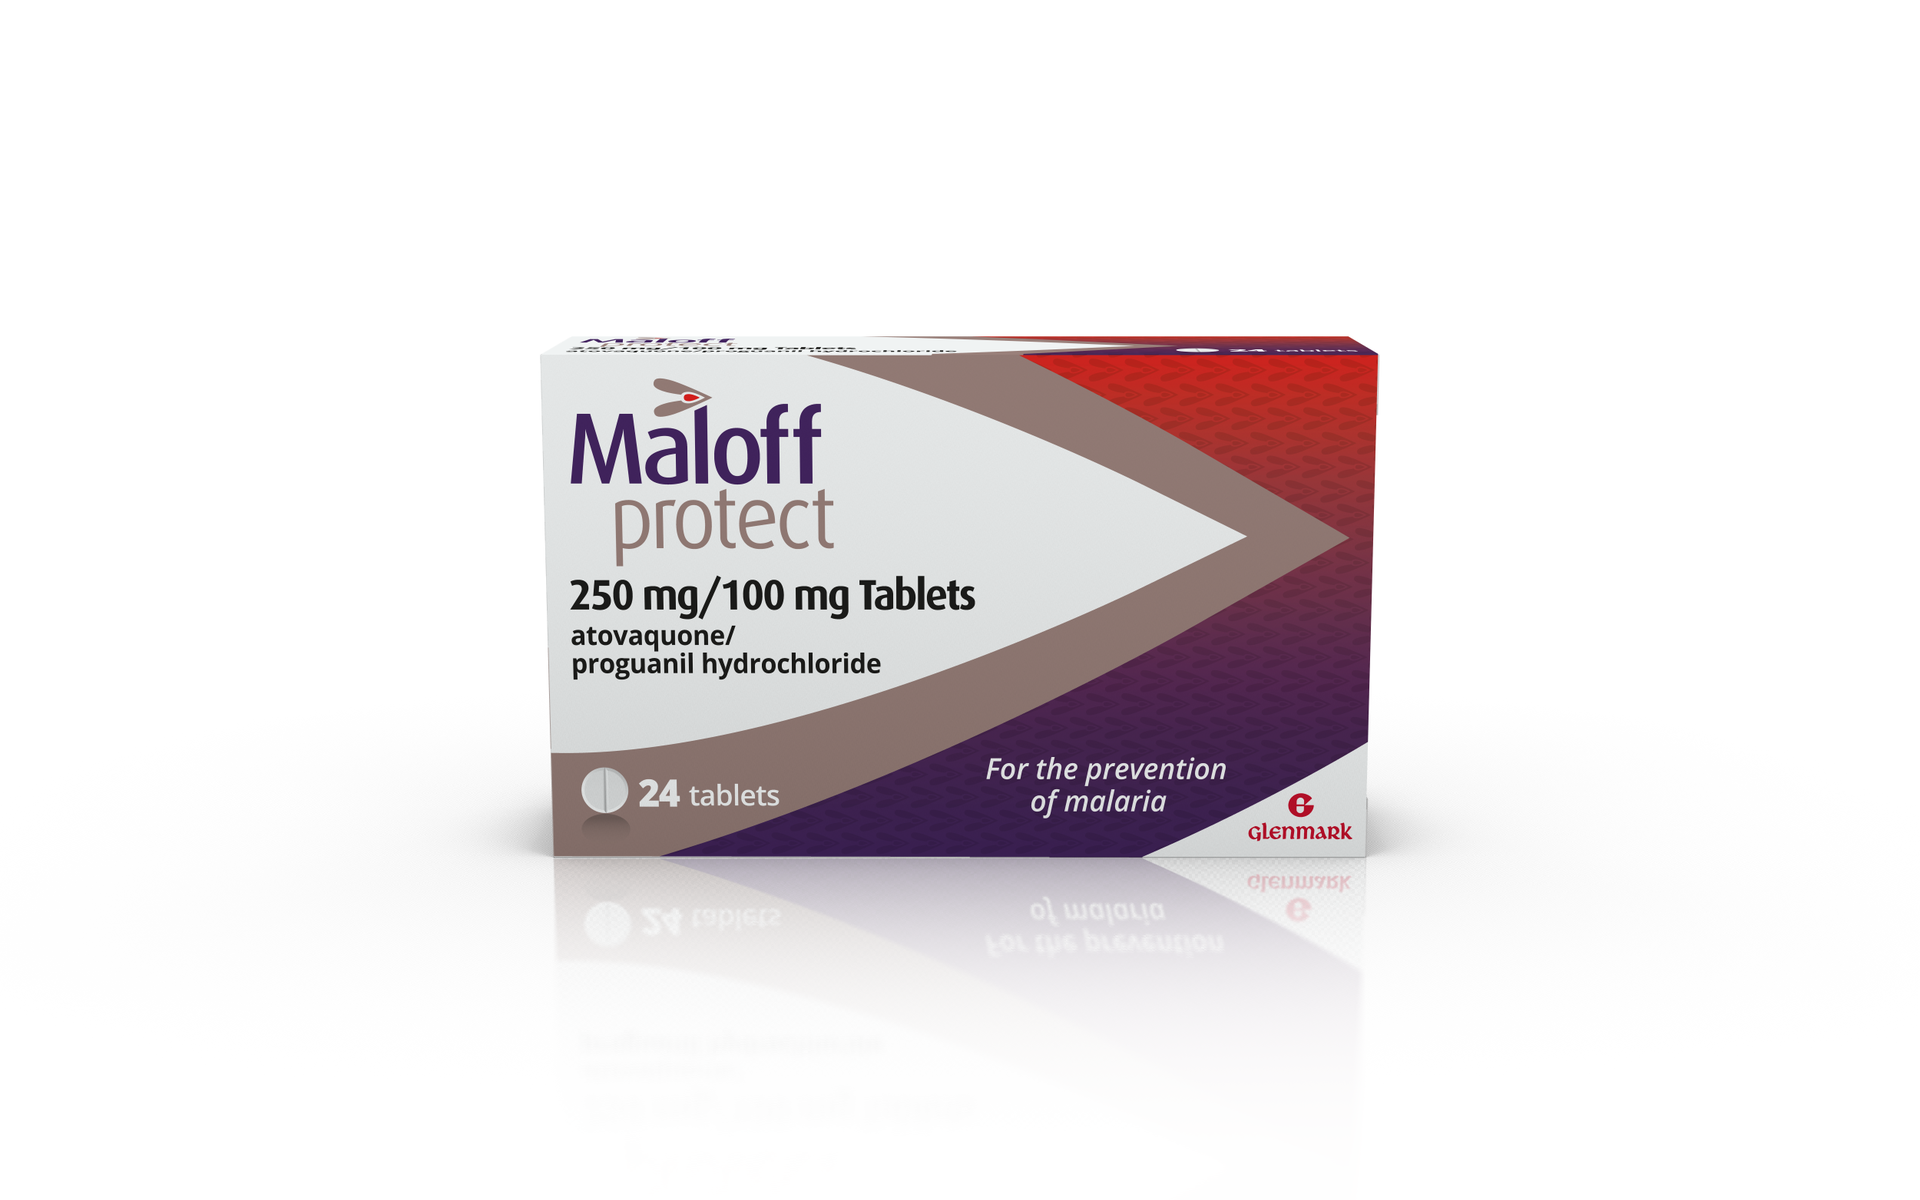 Maloff Protect Malaria - 24 Tablets 'Brand New for Pharmacies'